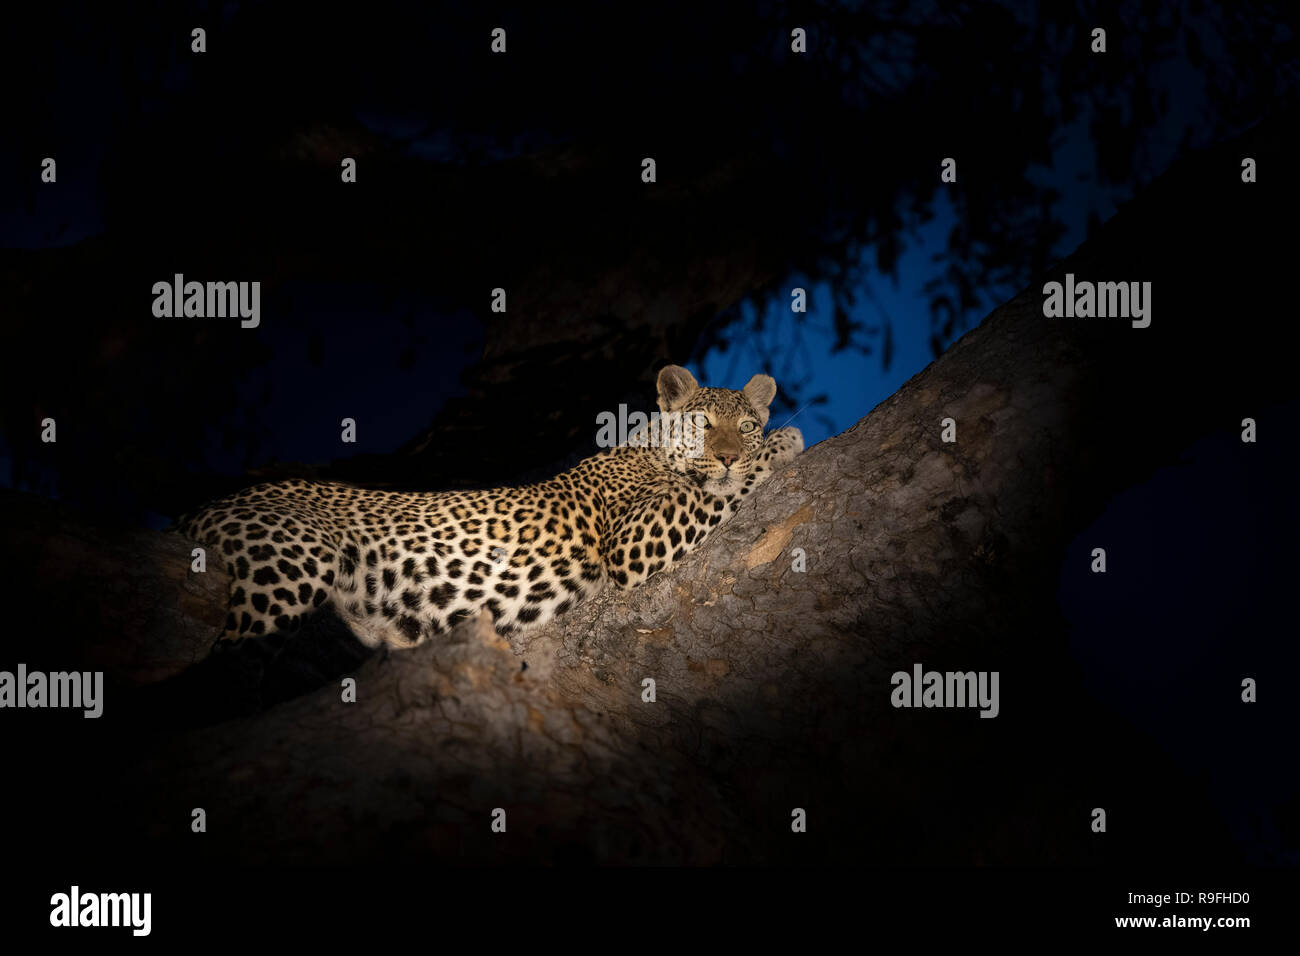 Pregnant leopard (Panthera pardus), Khwai conservancy, Botswana, - Stock Image